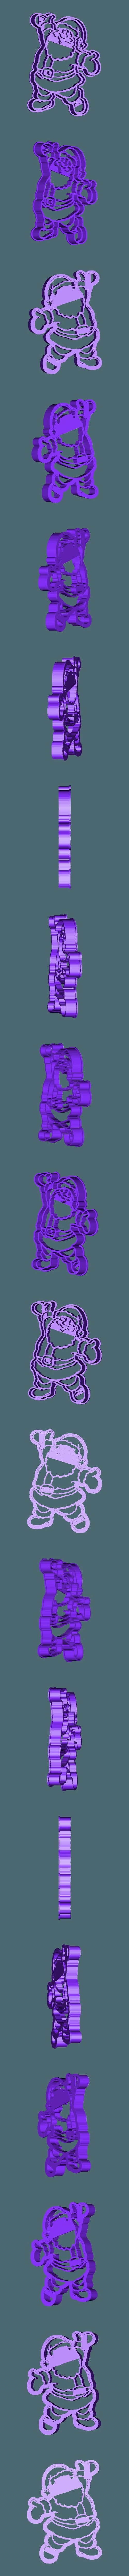 Papanoel Intermedio.stl Download free STL file Santa Claus Full Body Cookie Cutter • 3D printer model, araaftw